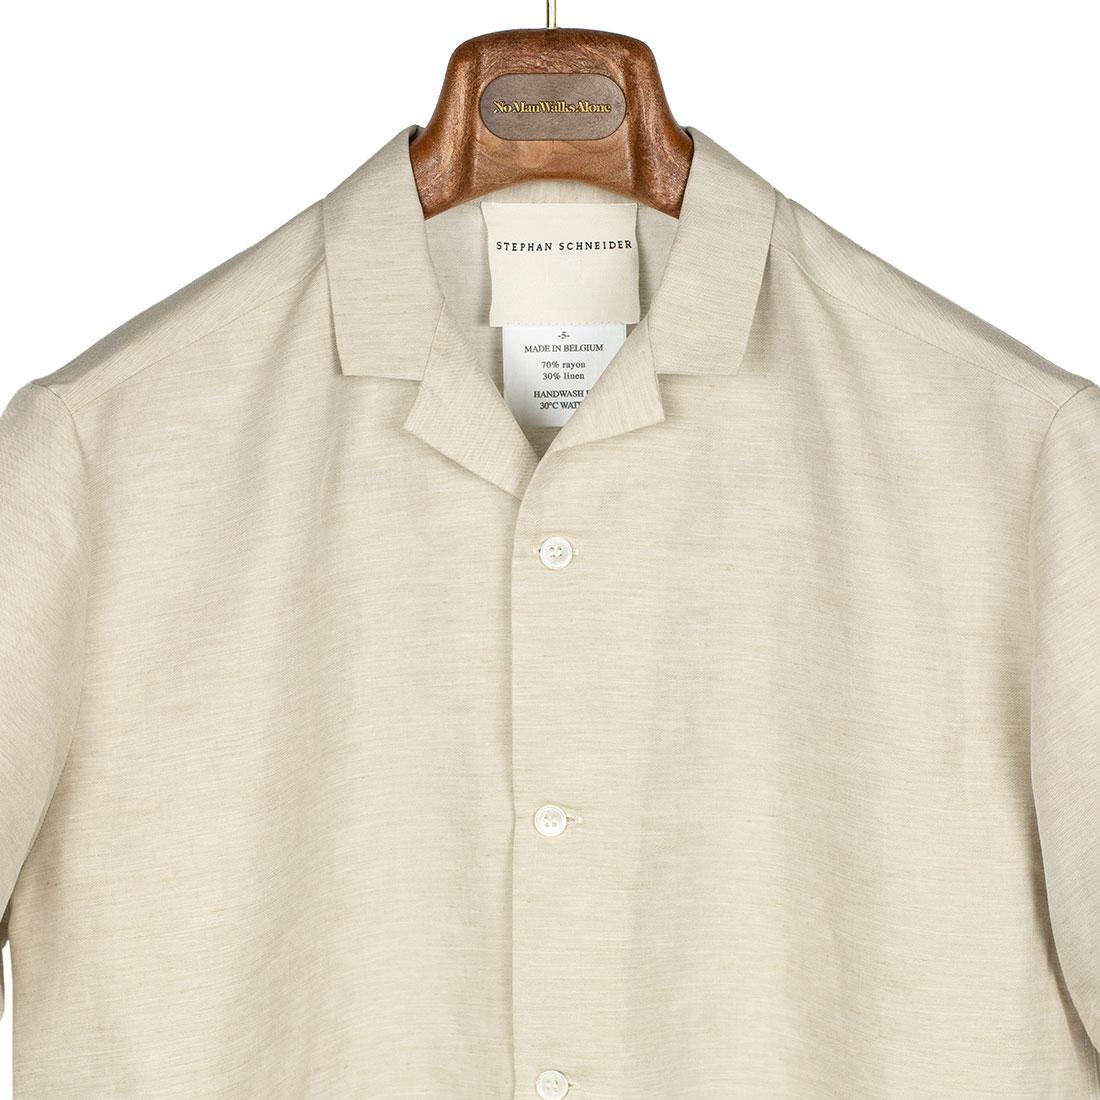 Stephan Schneider Spring Summer 2021 SS21 capri collar camp shirt (14).jpg